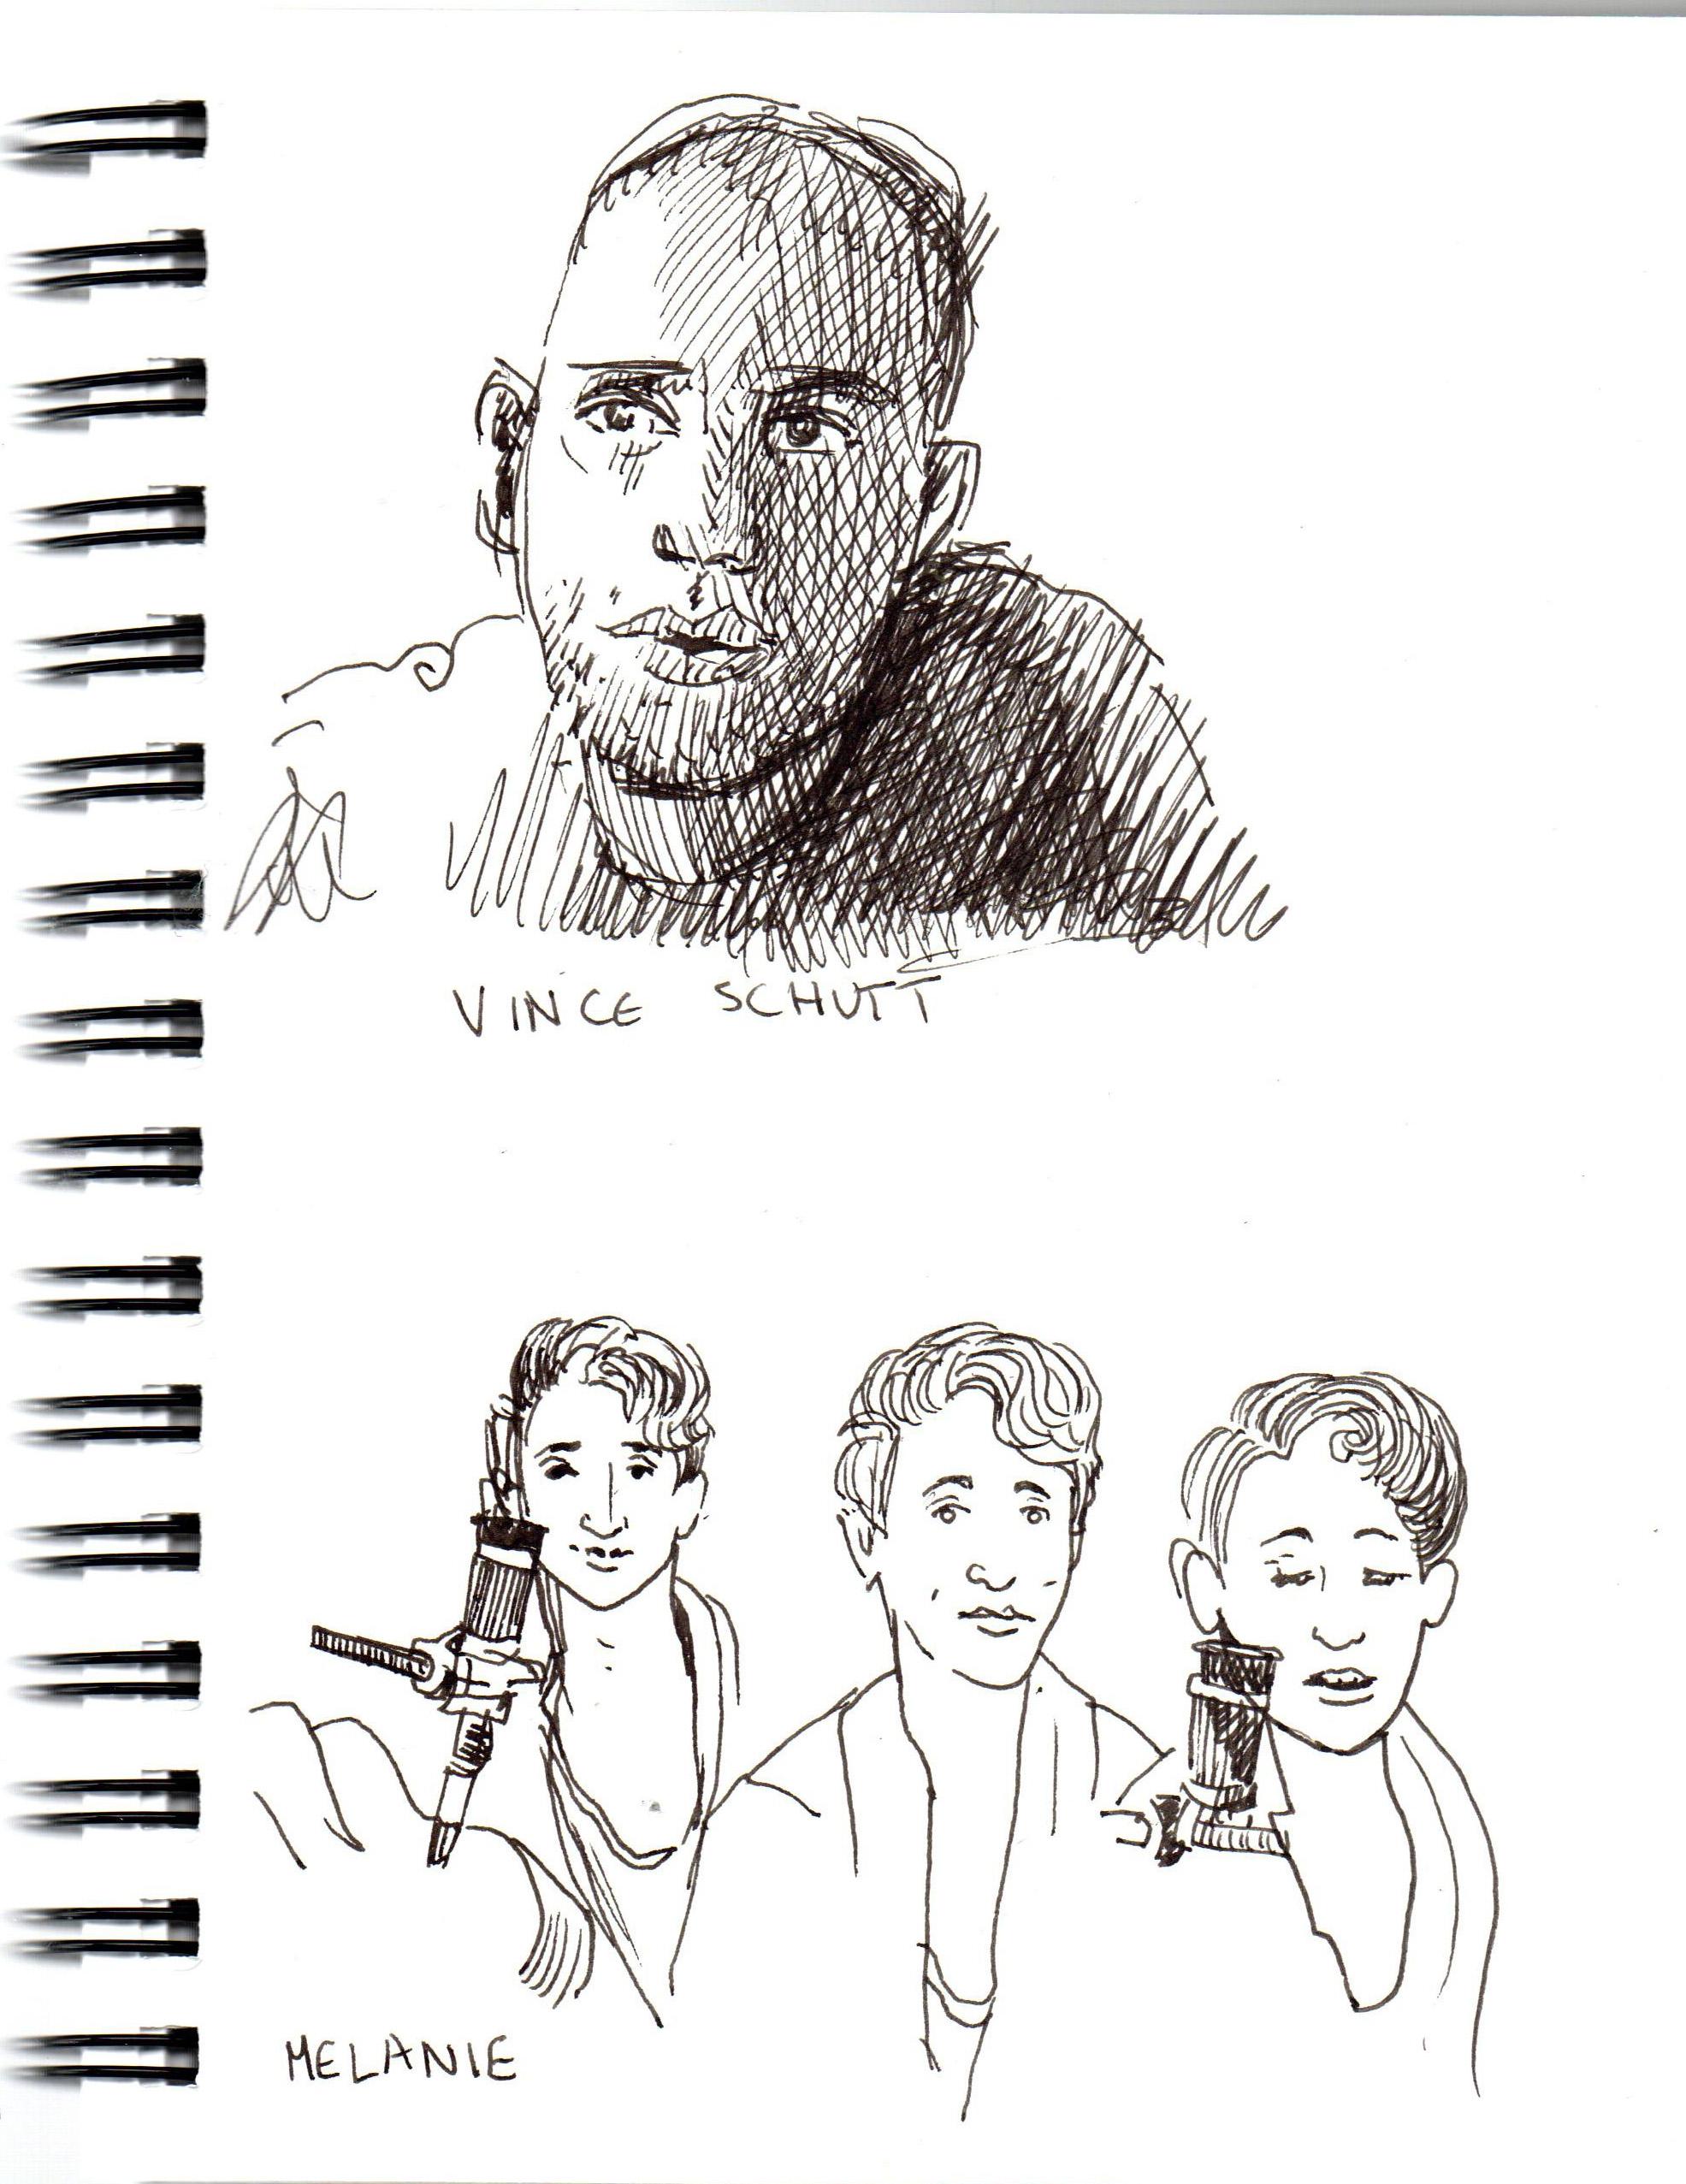 Vince Schutt and Melanie